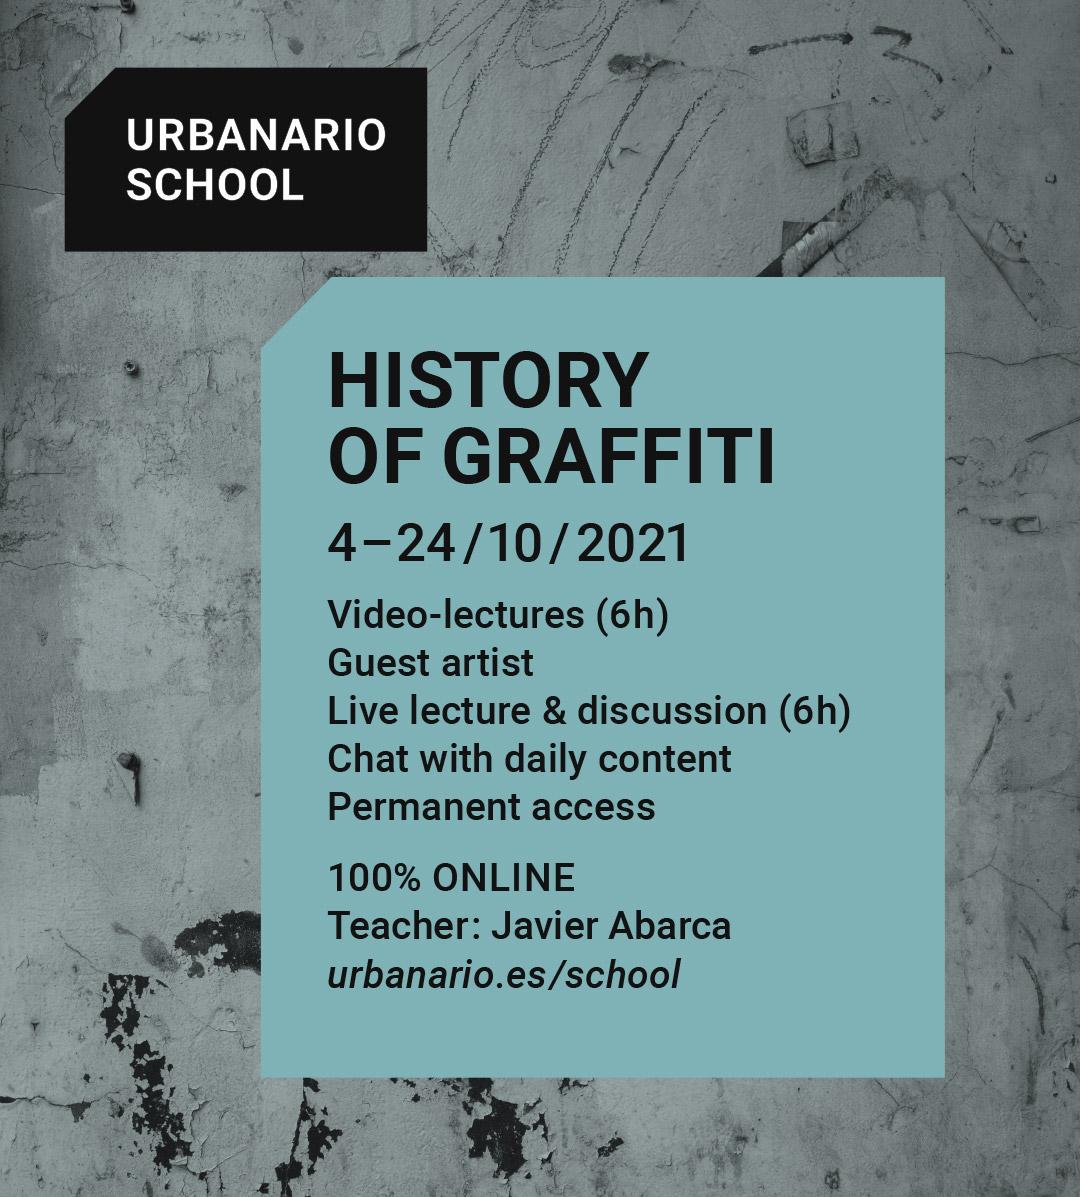 History of graffiti - Urbanario School